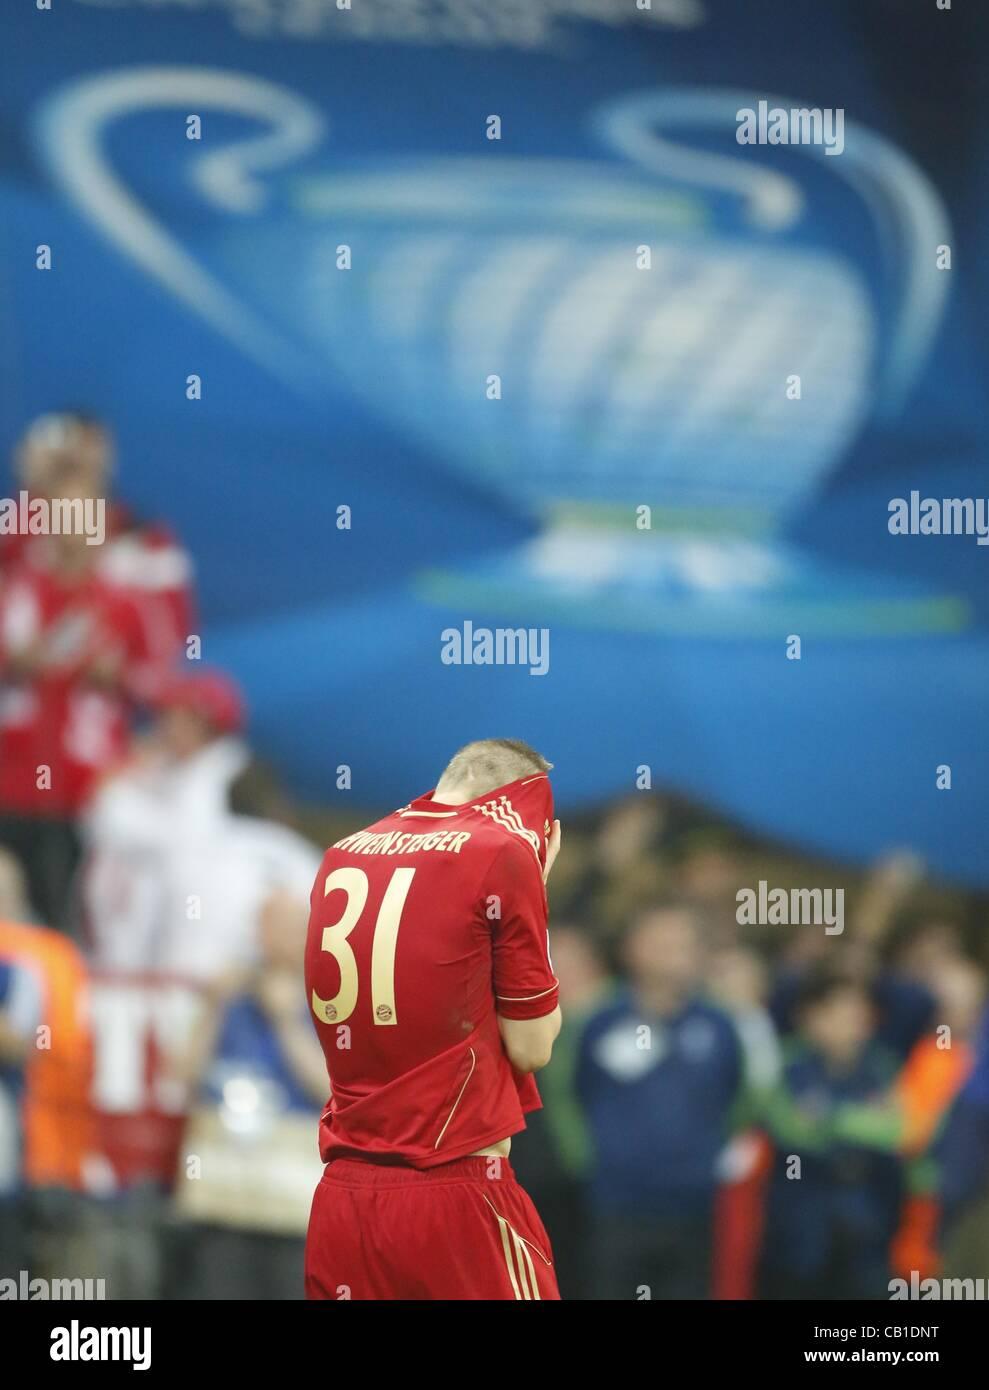 Bastian Schweinsteiger (Bayern #31) Emotionen, enttäuscht, Enttäuschung, Frust, frustriert, Trauer ,traurig, - Stock Image